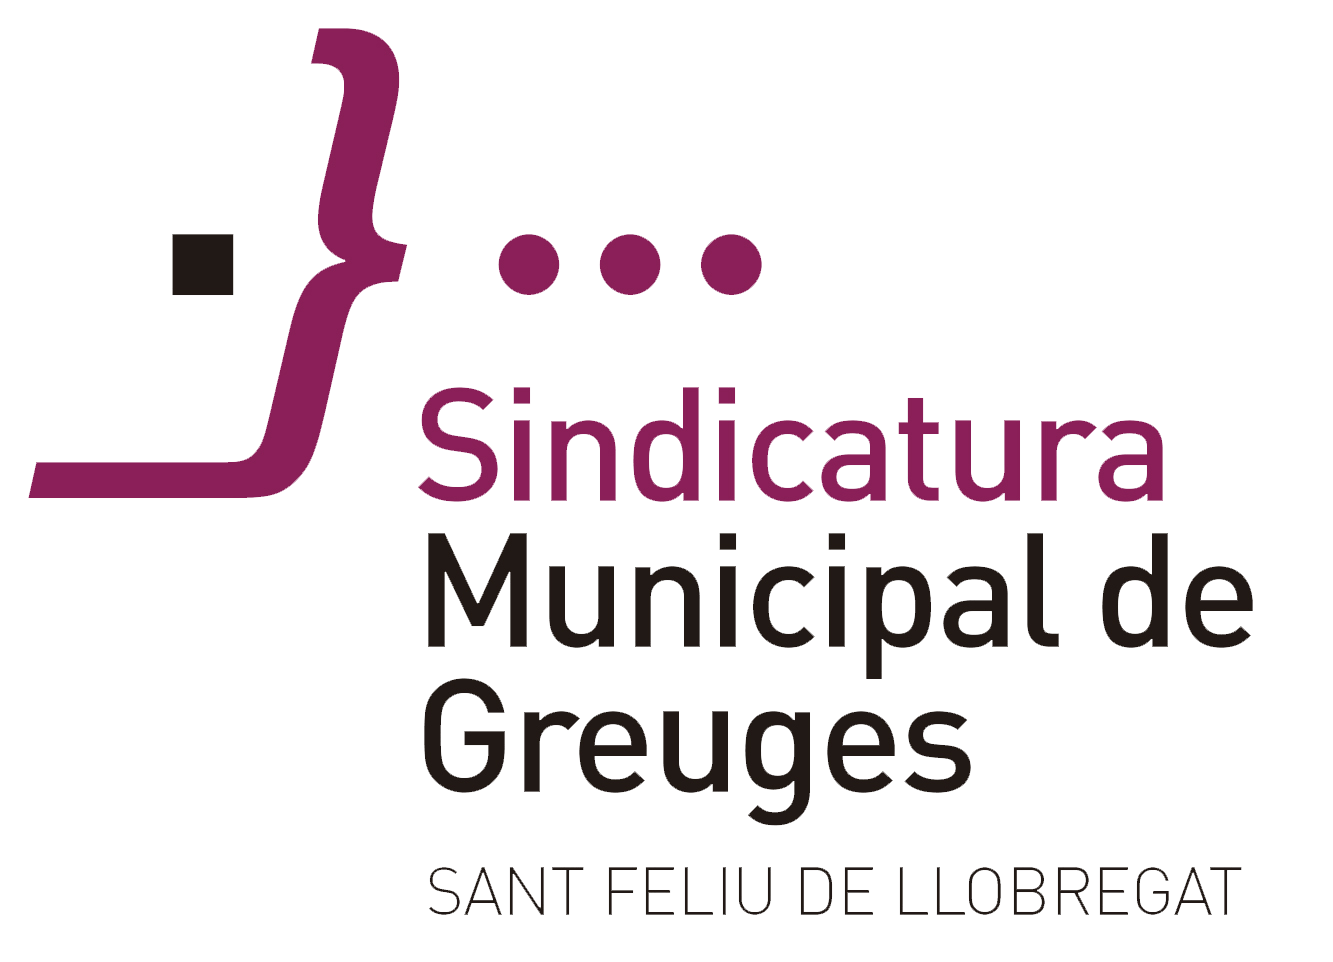 Sant Feliu del Llobregat